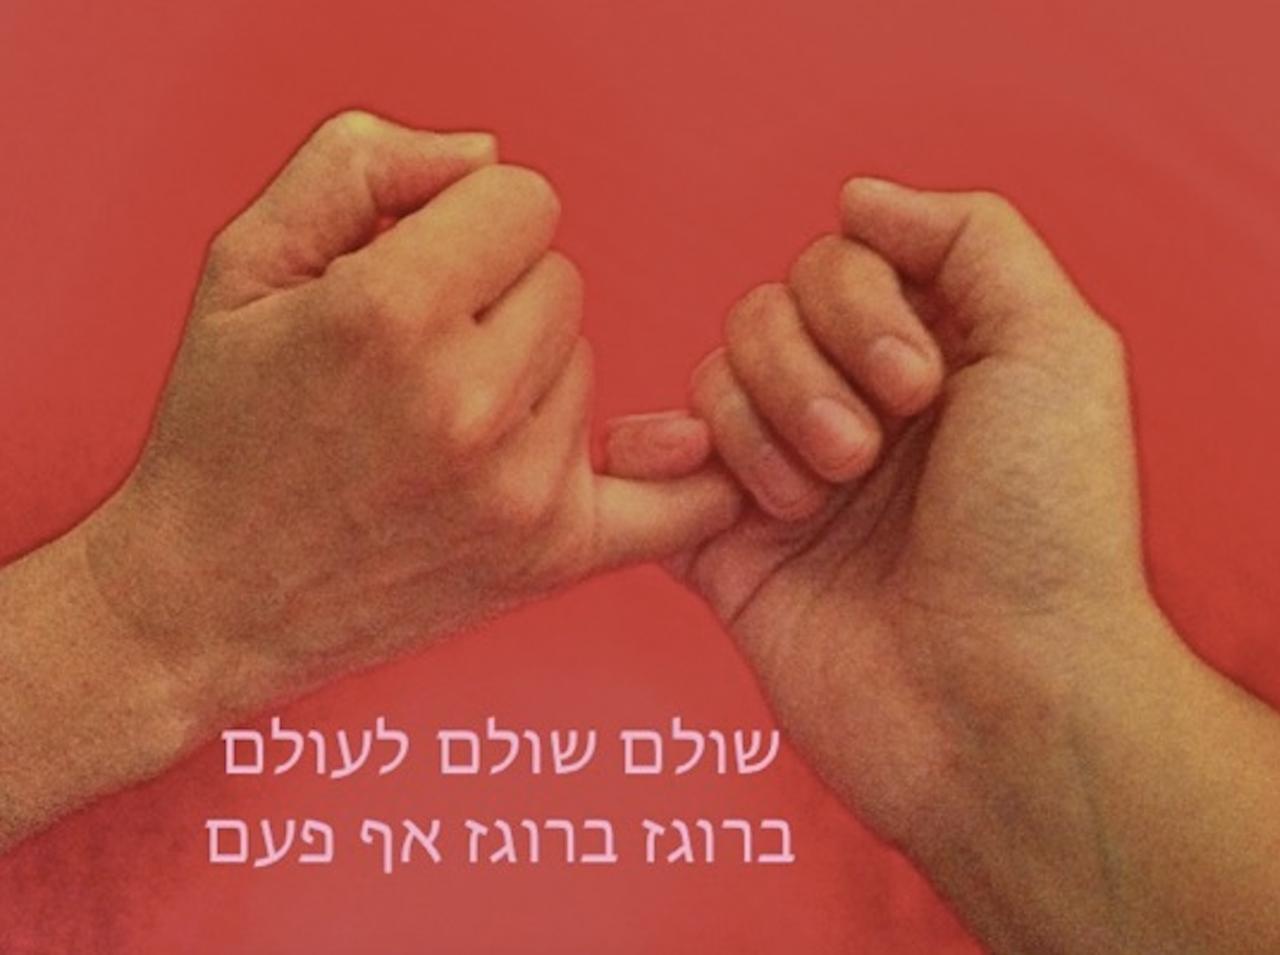 Children's Pinky Shake , Text: Sholem, sholem l'olam brogez, brogez, af pa-am! Translation :peace, peace forever,falling-out never again